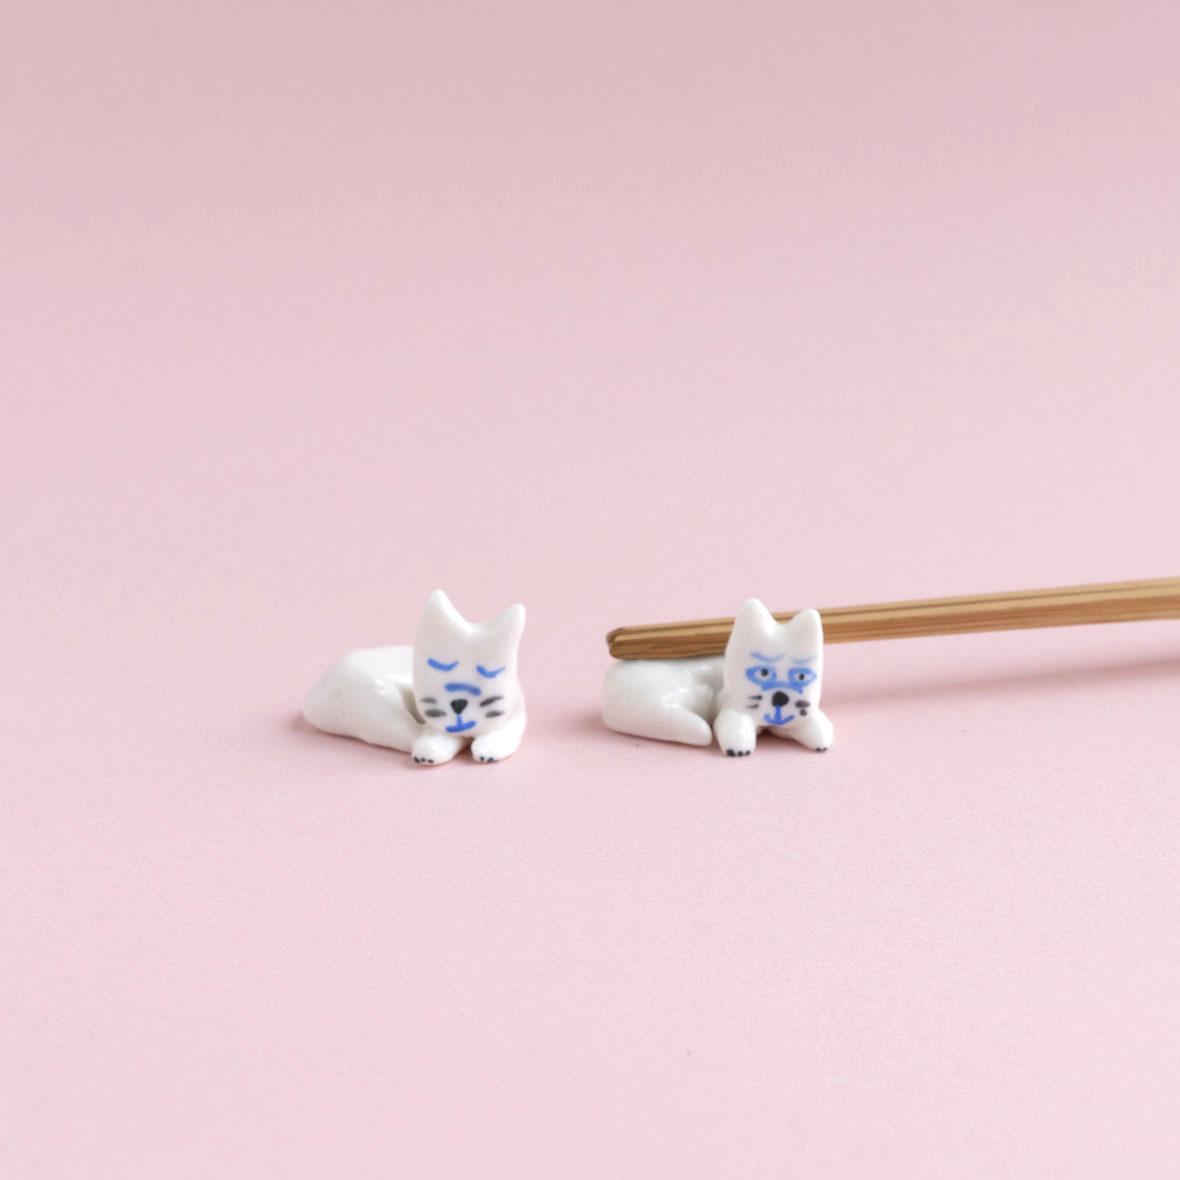 【TK】箸置き(ねこ・ラウンド)NO.13